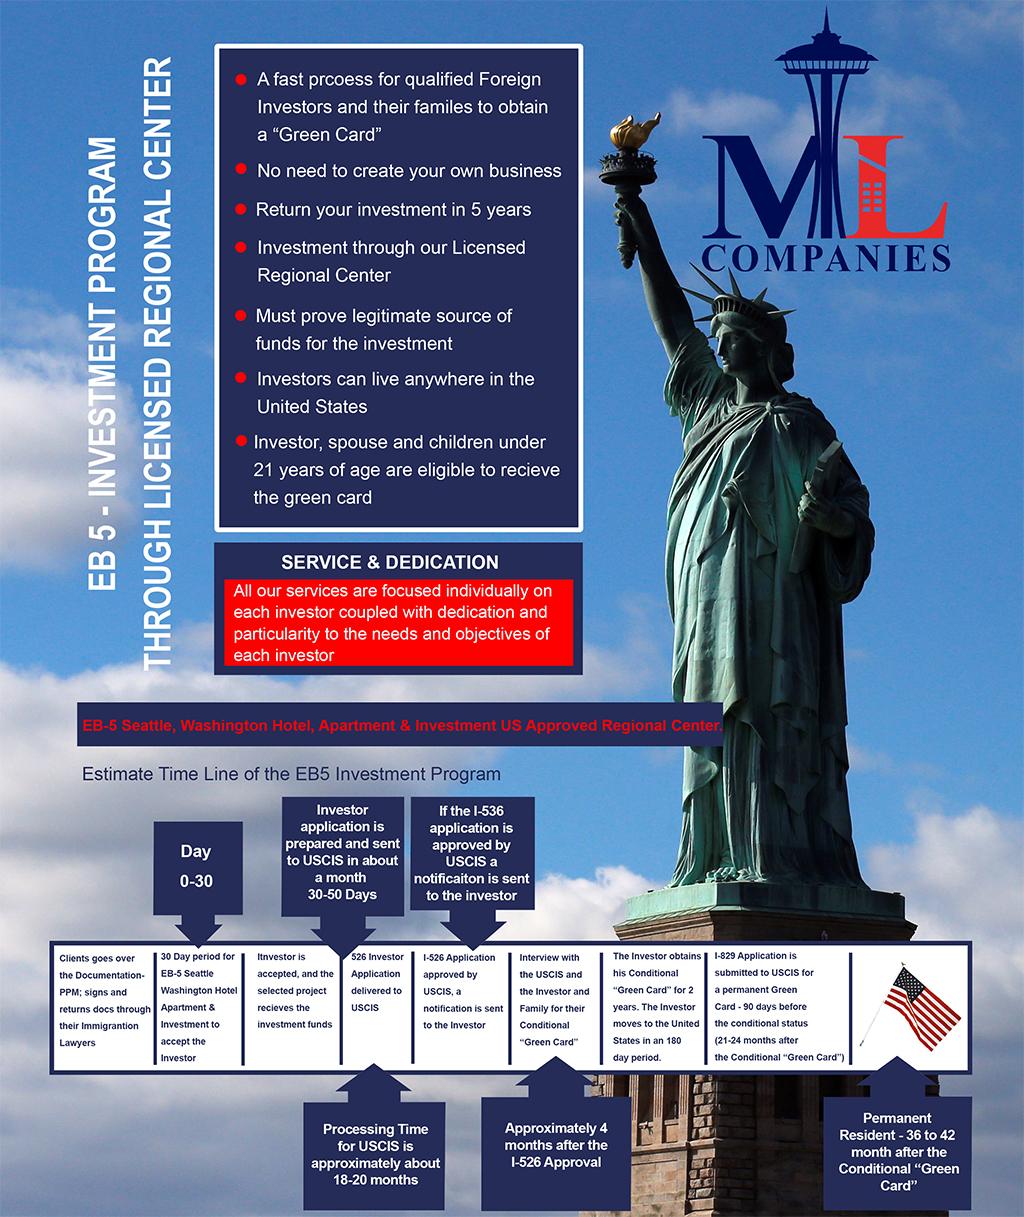 EB5-Visa Program Process